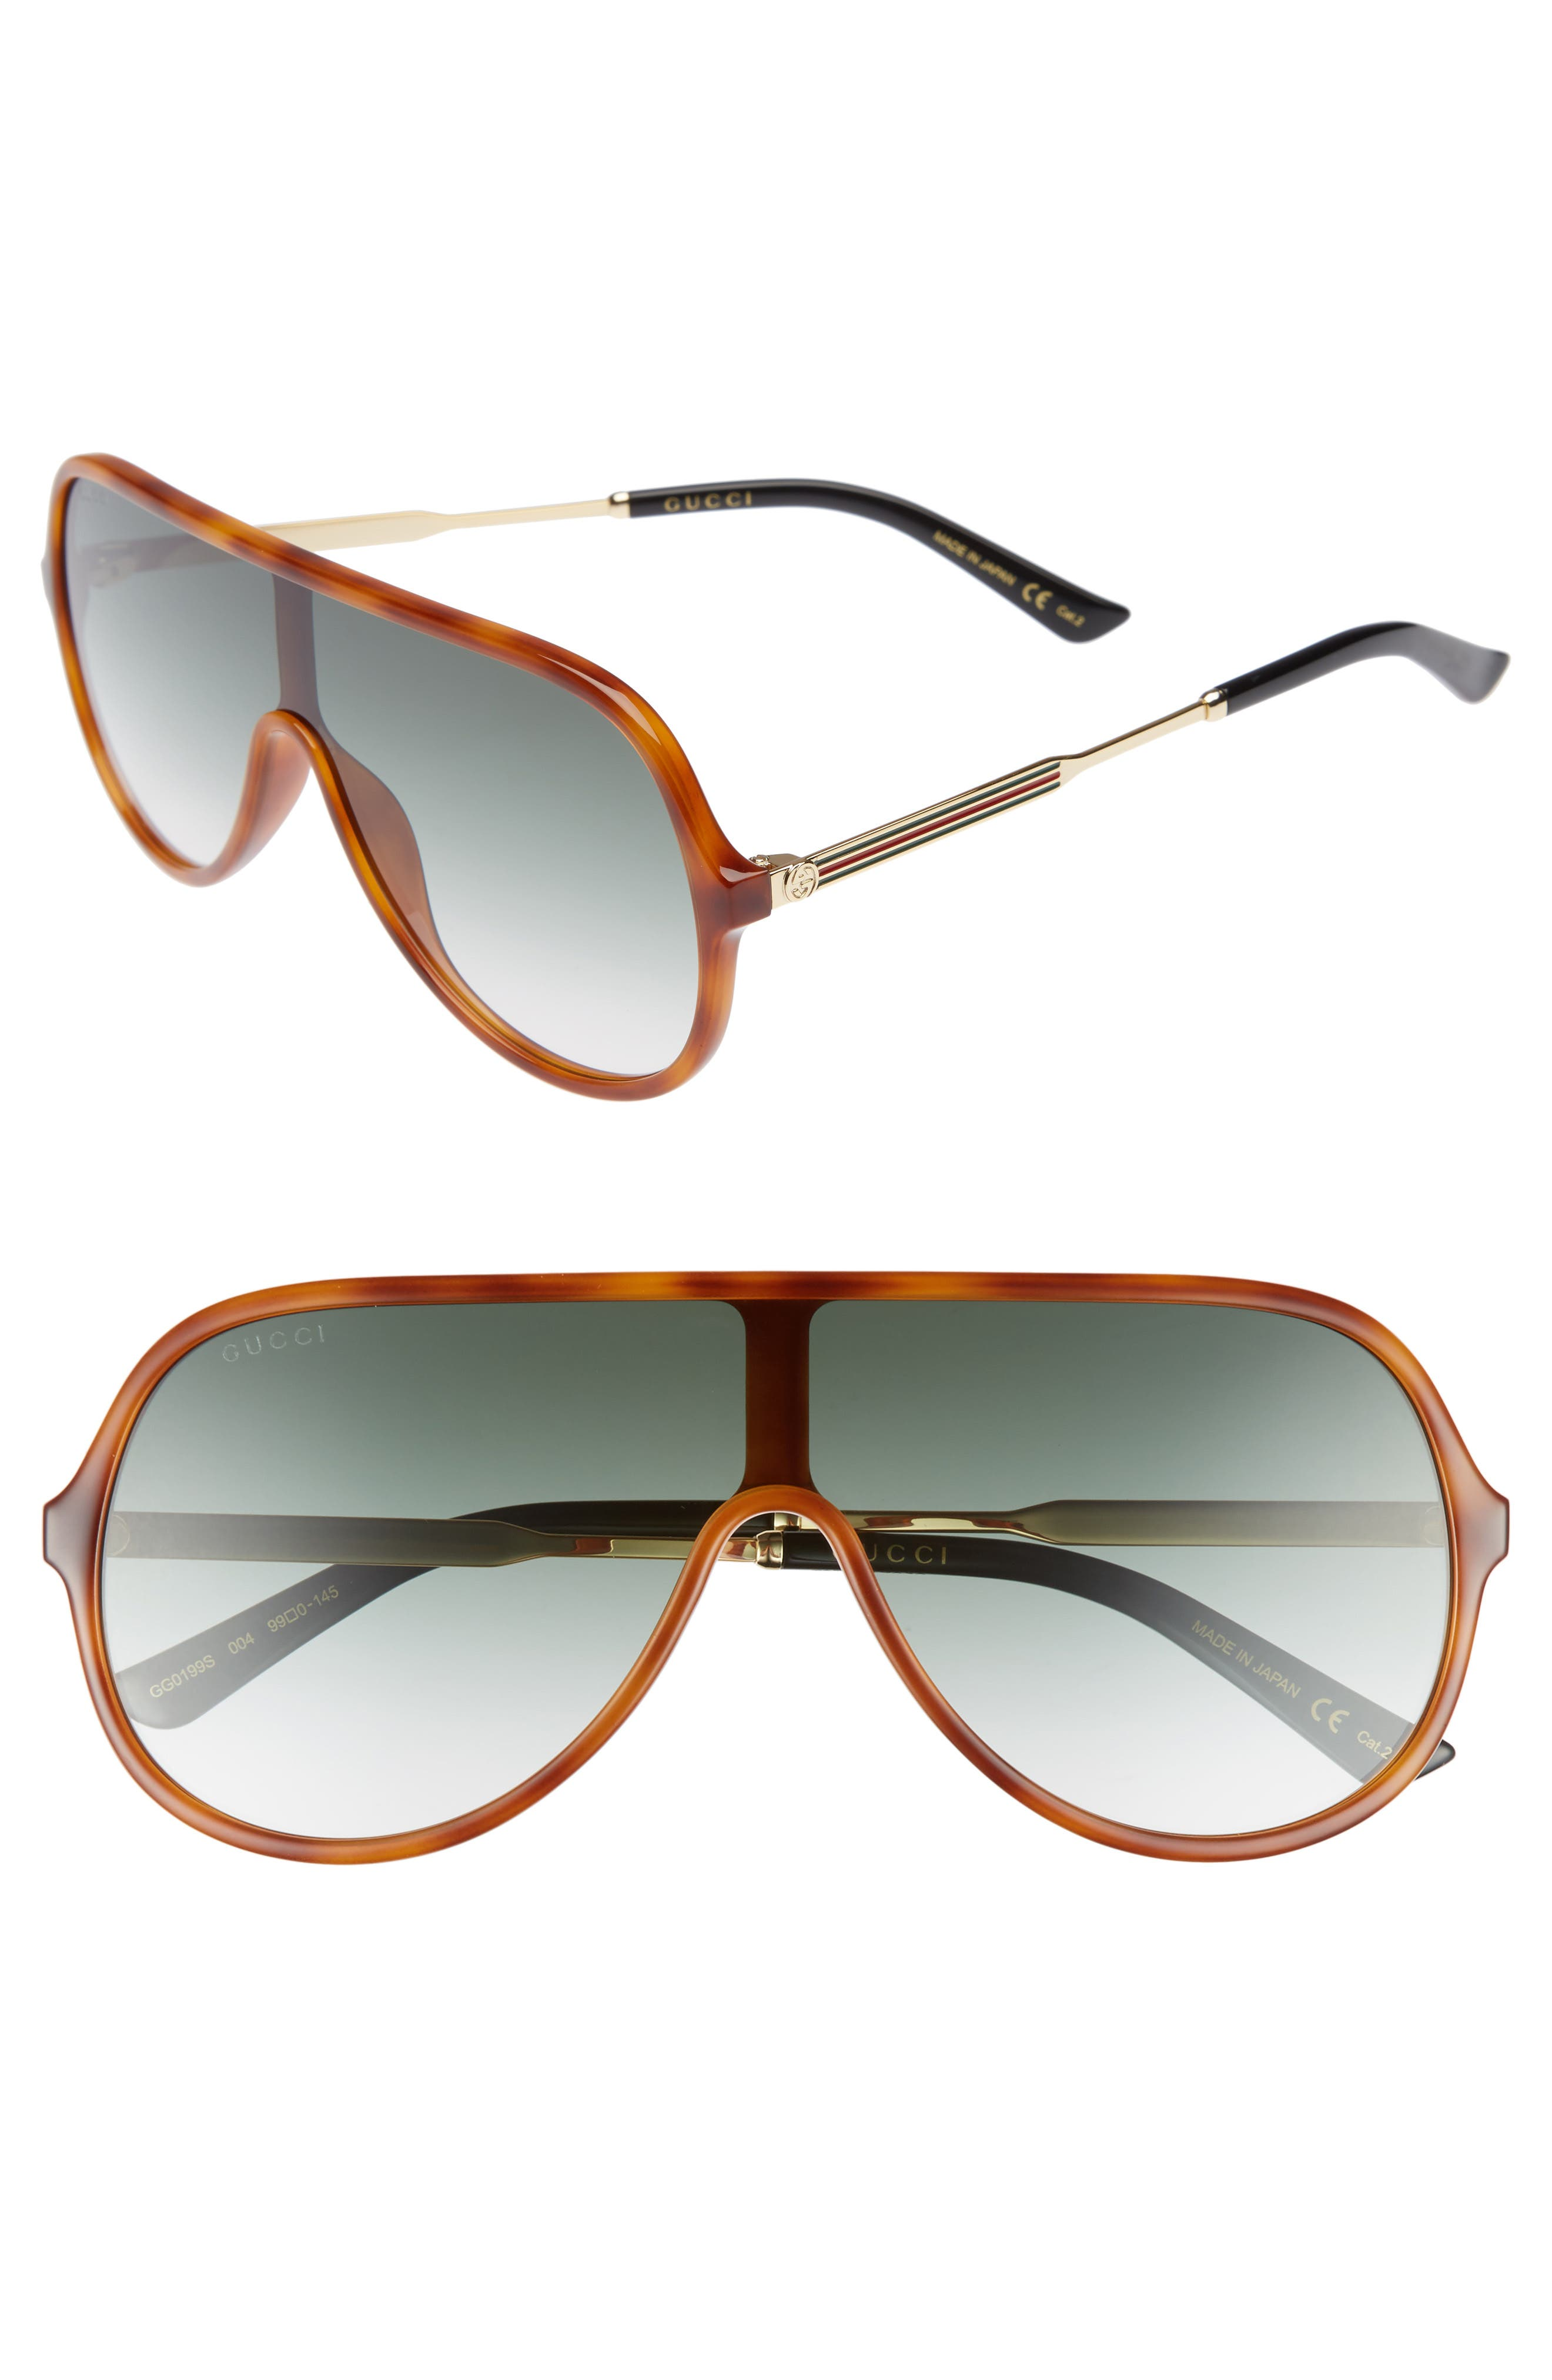 Main Image - Gucci 99mm Oversize Shield Sunglasses